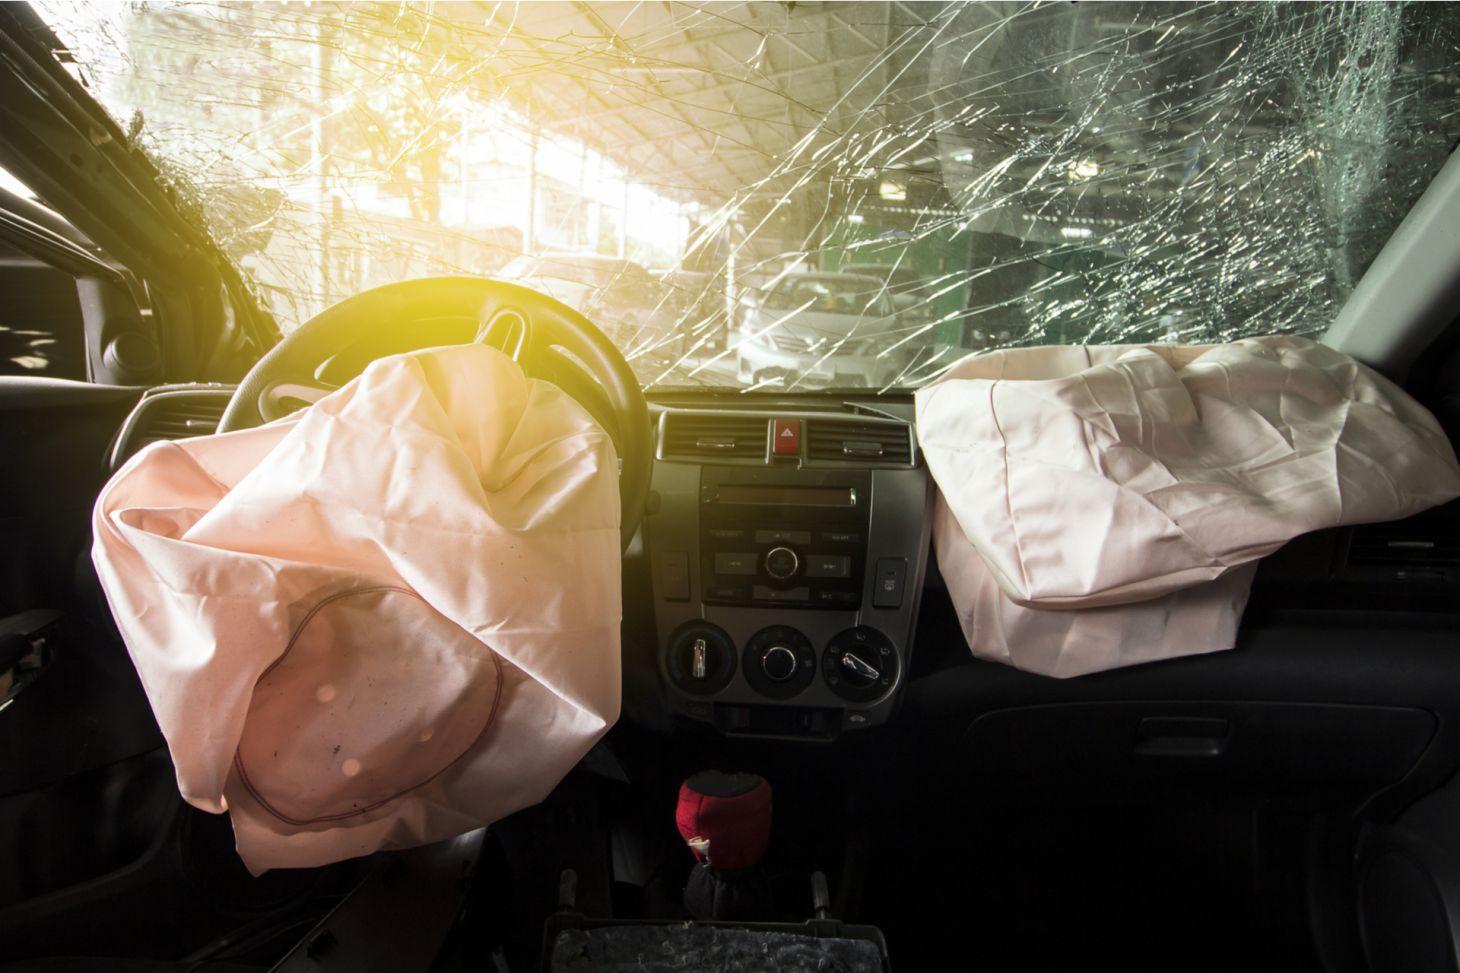 airbags takata nitrato amonia explosivo carro automovei recall brasil